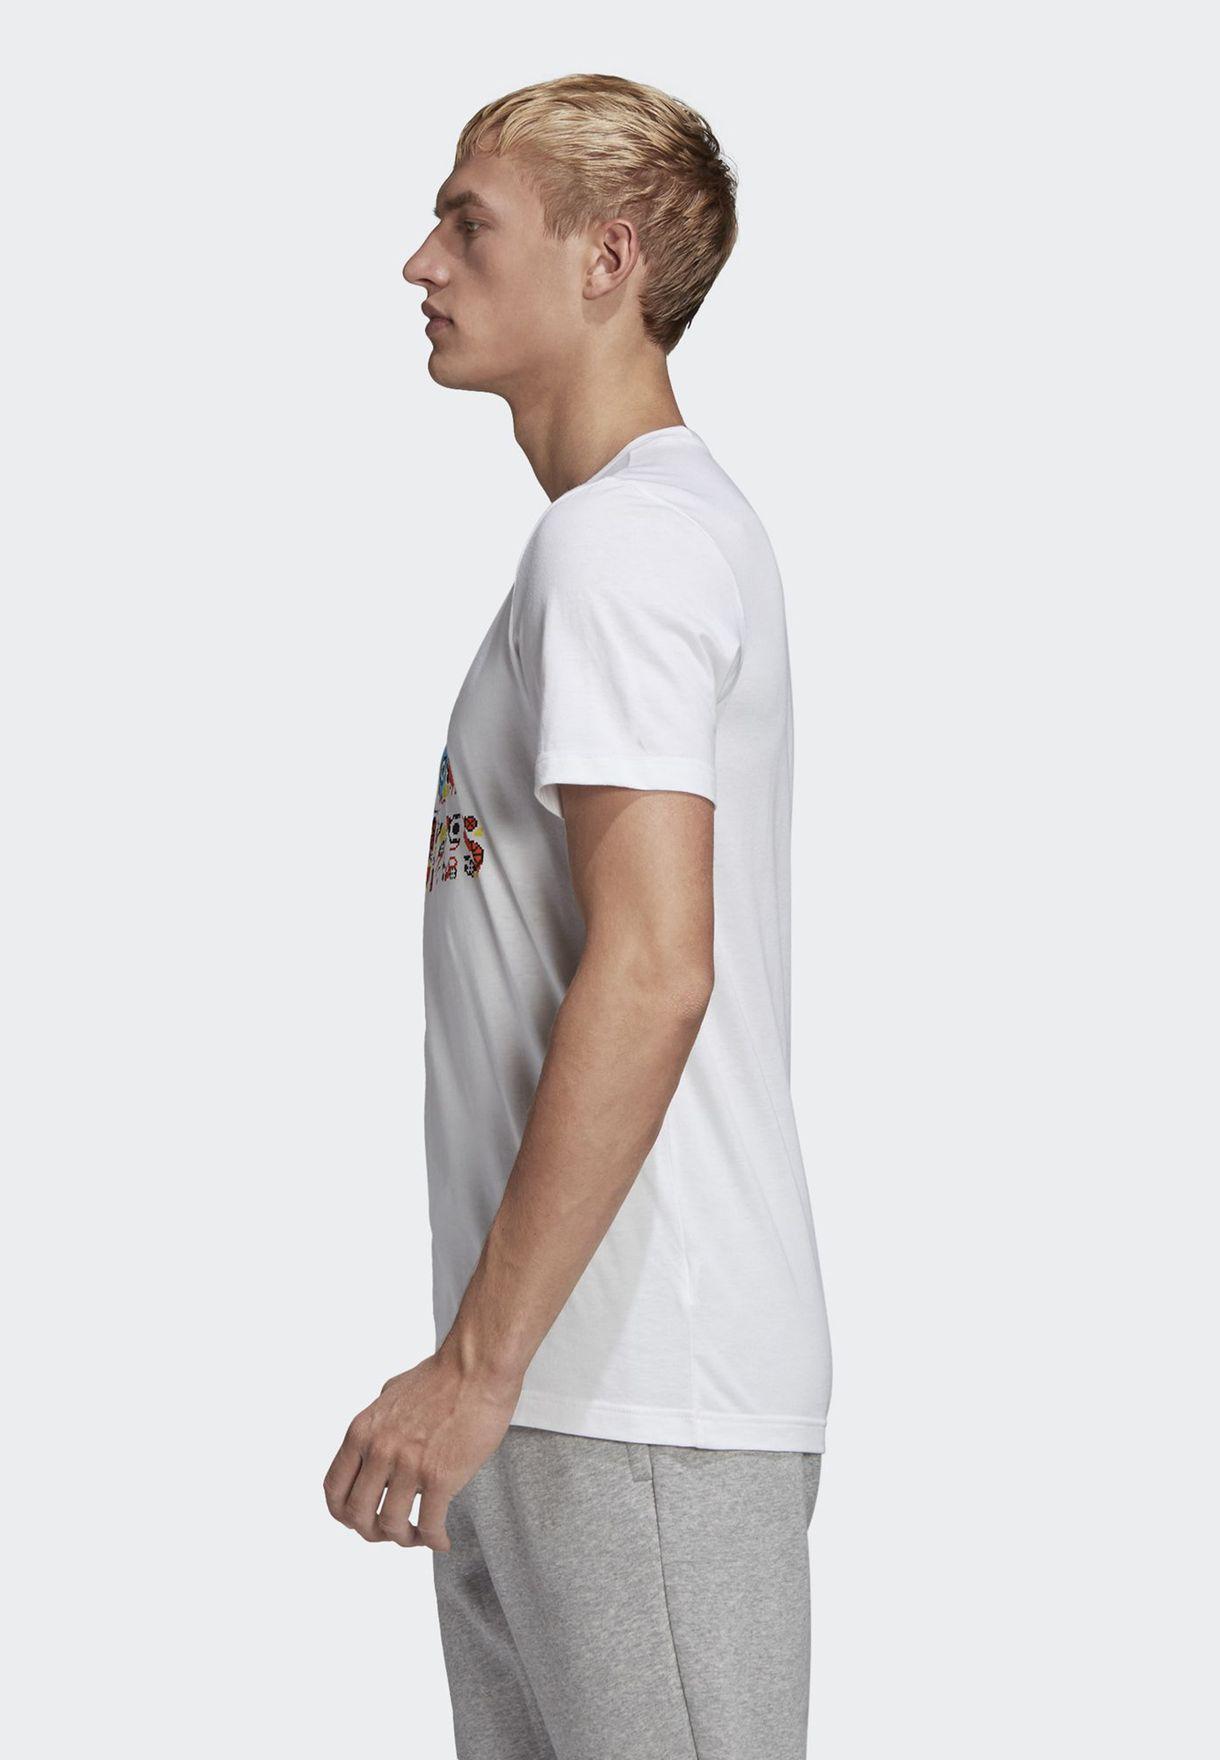 8-Bit BOS T-Shirt